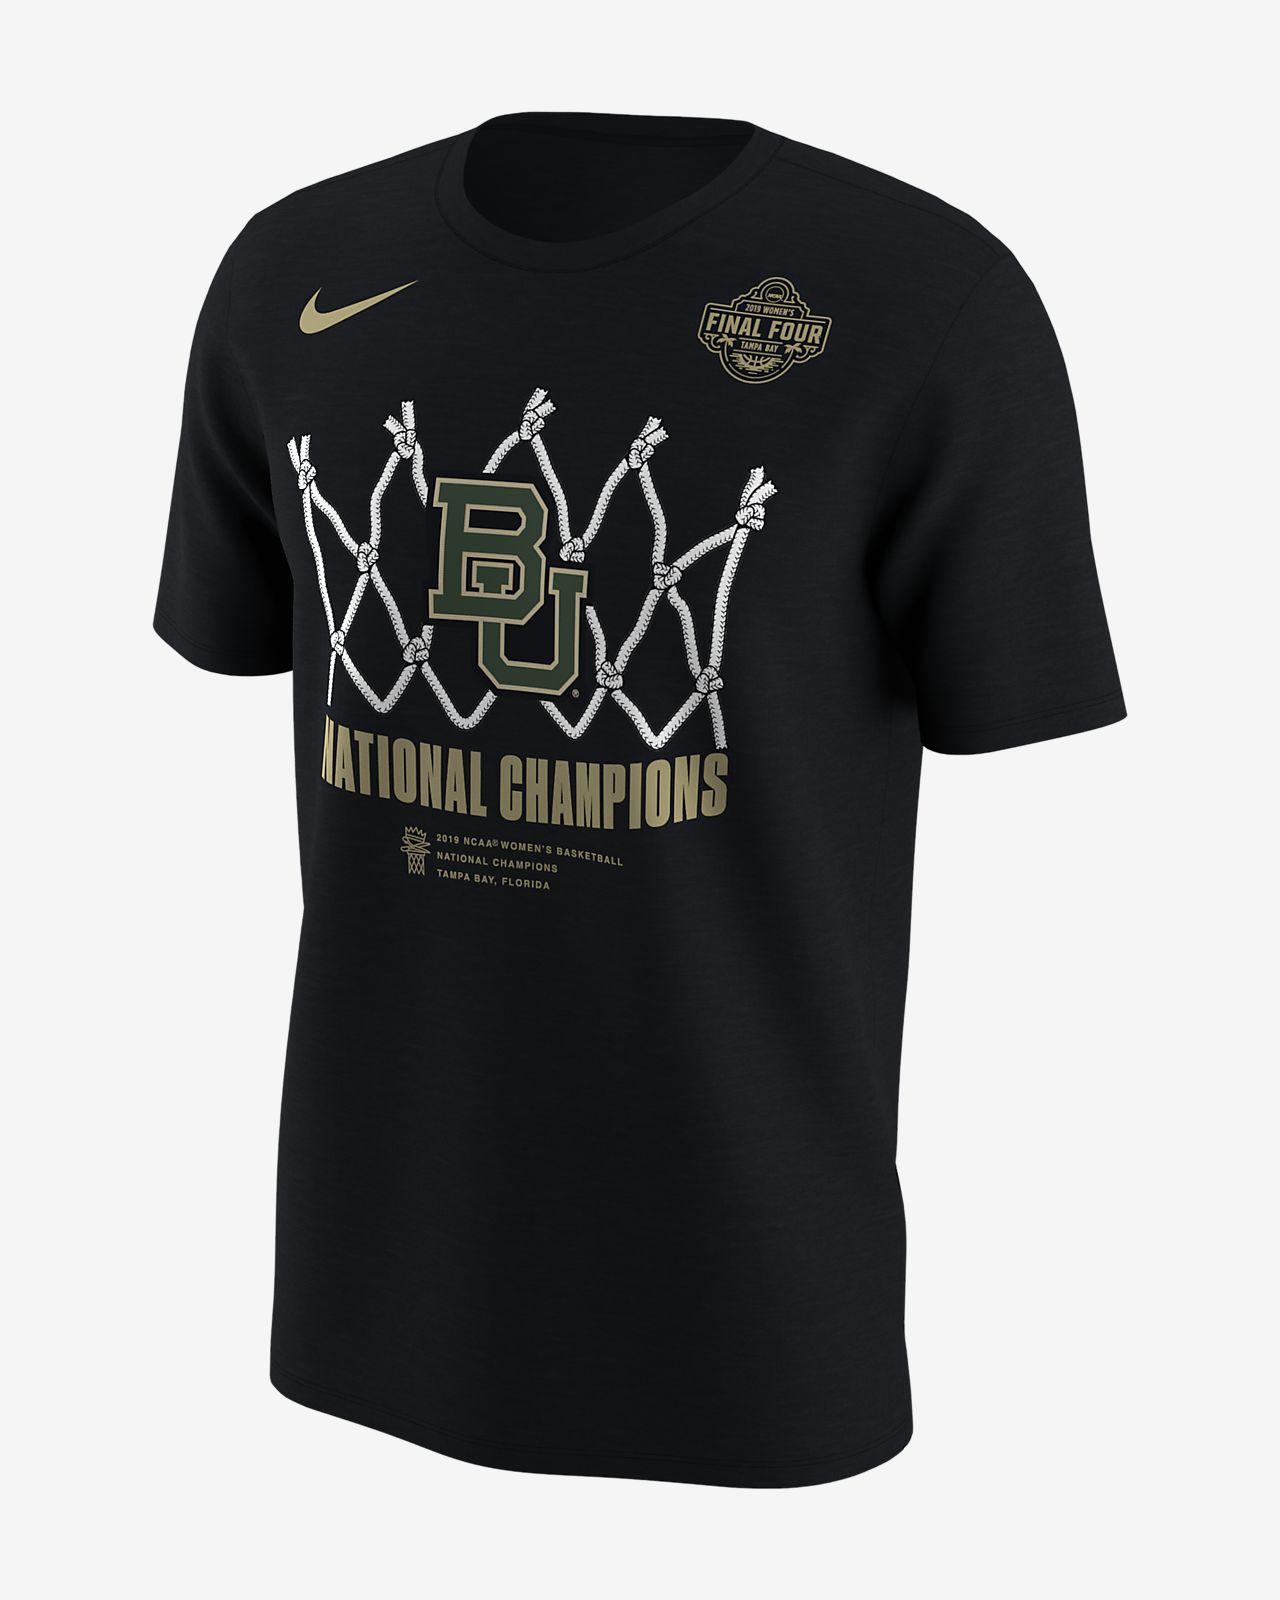 8ba63e62a42c5 Nike College Final Four Championship Locker Room (Baylor) Men s ...